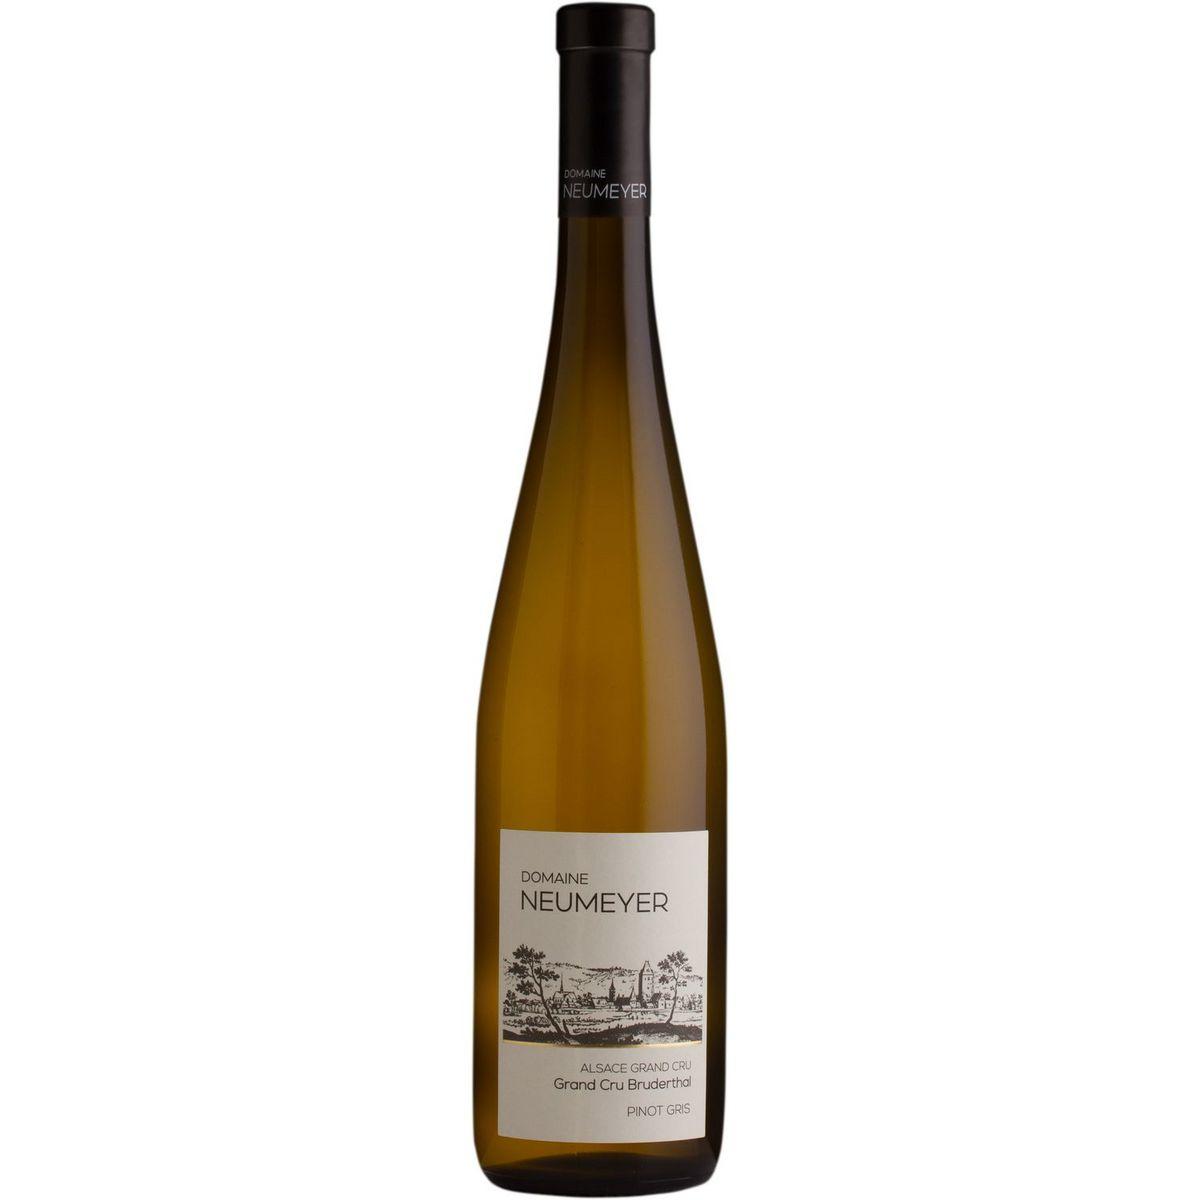 AOP Alsace Grand Cru Pinot Gris Bio Bruderthal Domaine Neumeyer blanc 2018